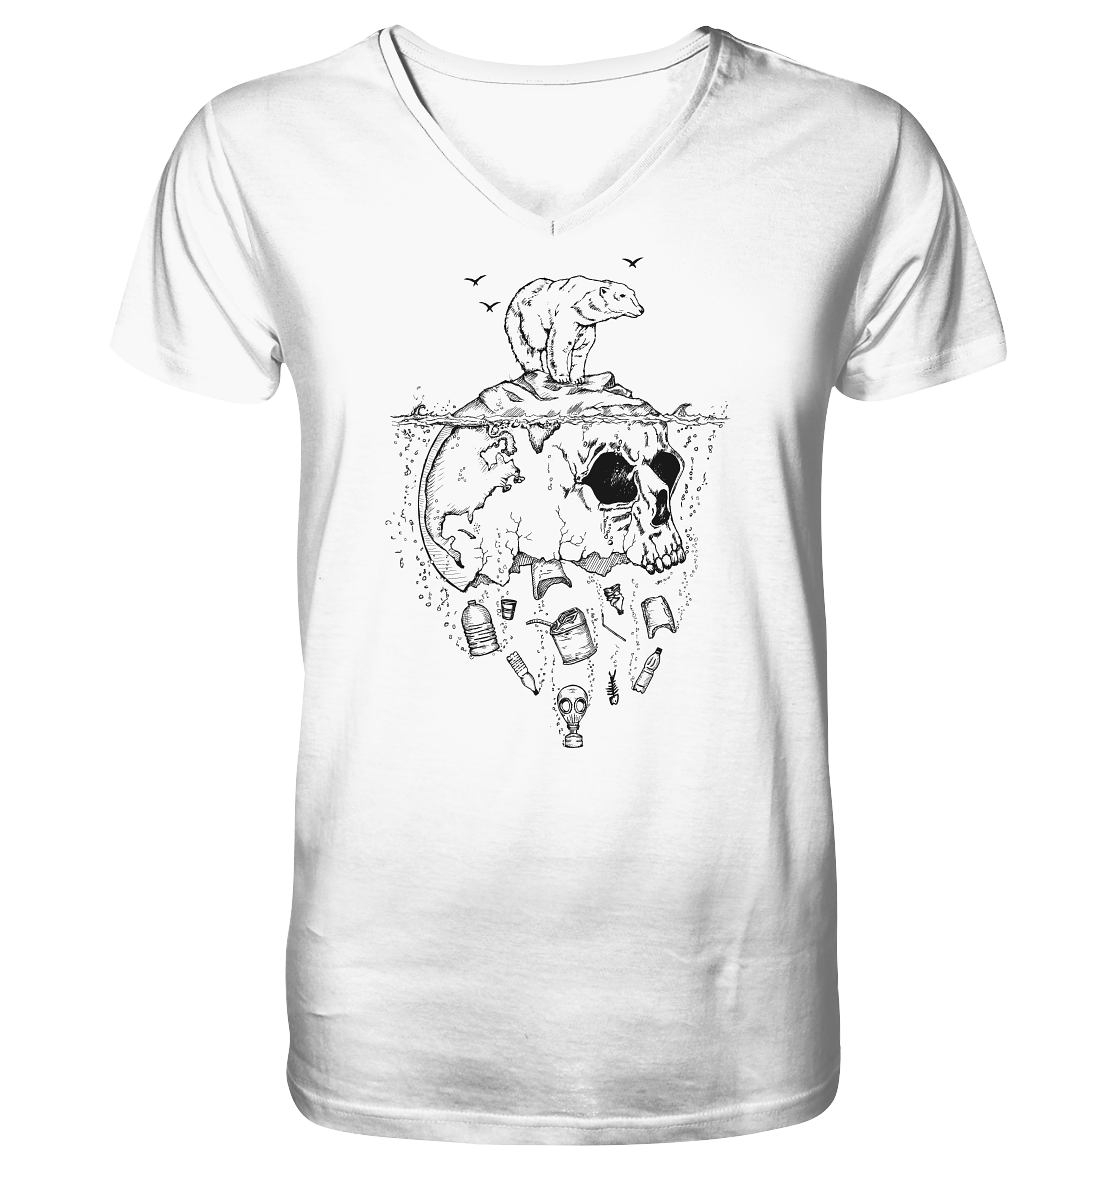 front-mens-organic-v-neck-shirt-f8f8f8-1116x-3.png